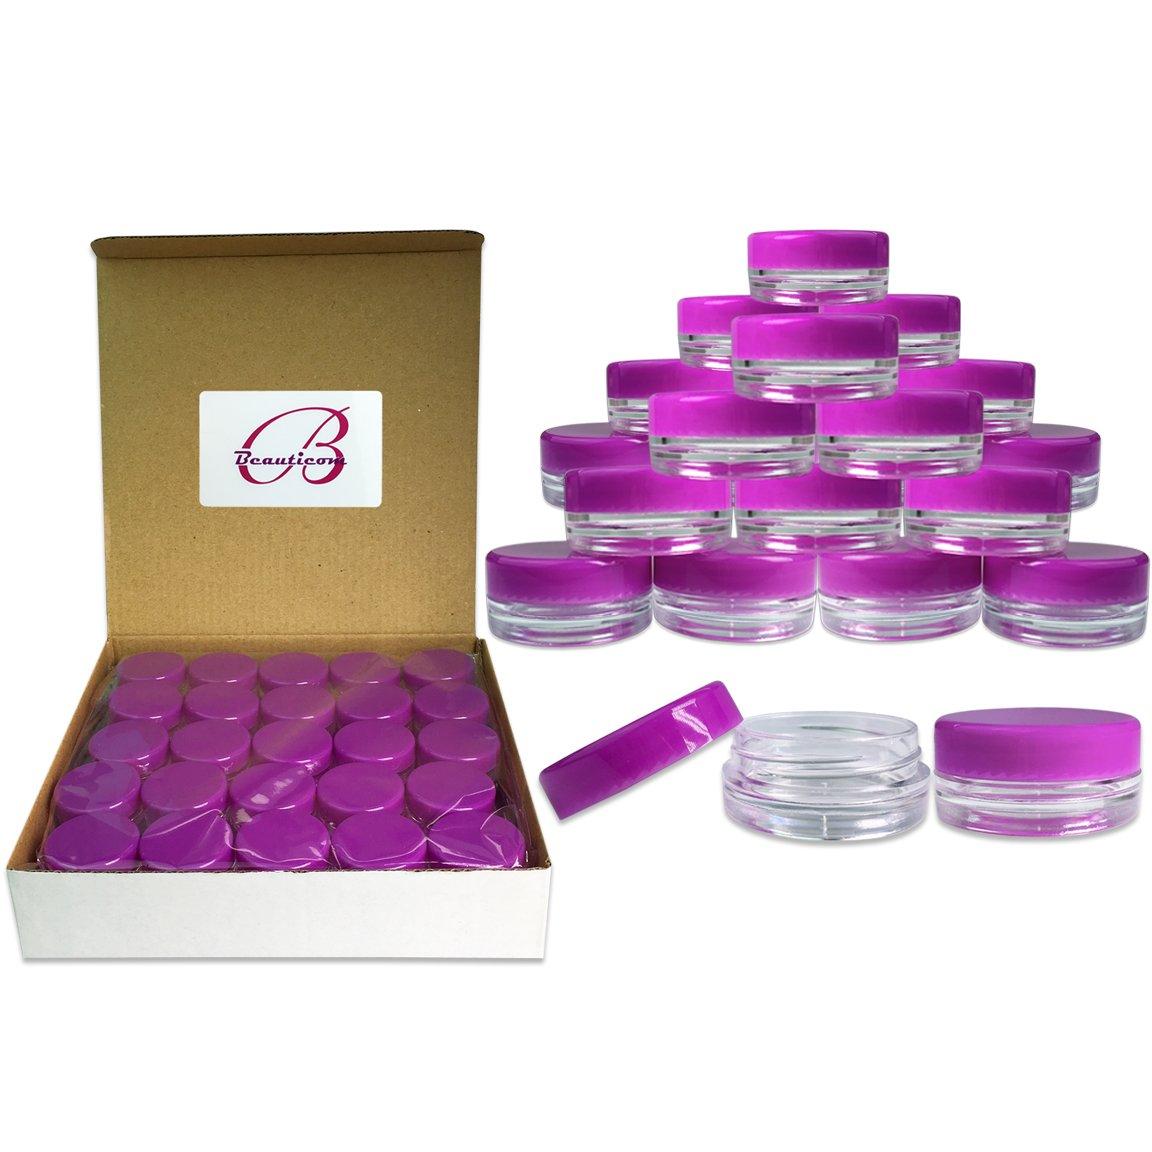 (Quantity: 100 Pieces) Beauticom 3G/3ML Round Clear Jars with PURPLE Lids for Scrubs, Oils, Toner, Salves, Creams, Lotions, Makeup Samples, Lip Balms - BPA Free